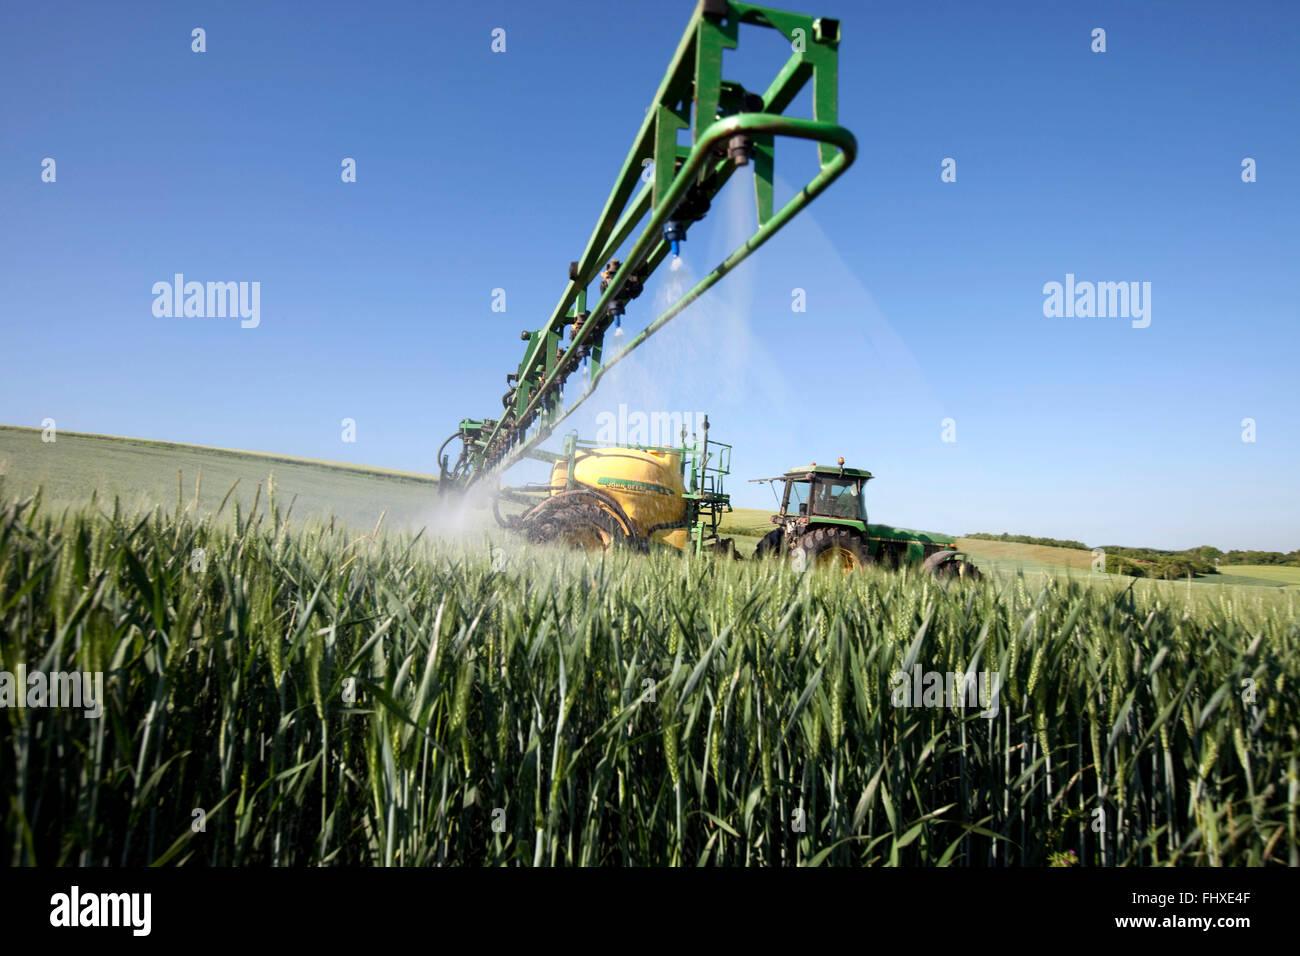 Fungicidal treatment in a corn field - Stock Image